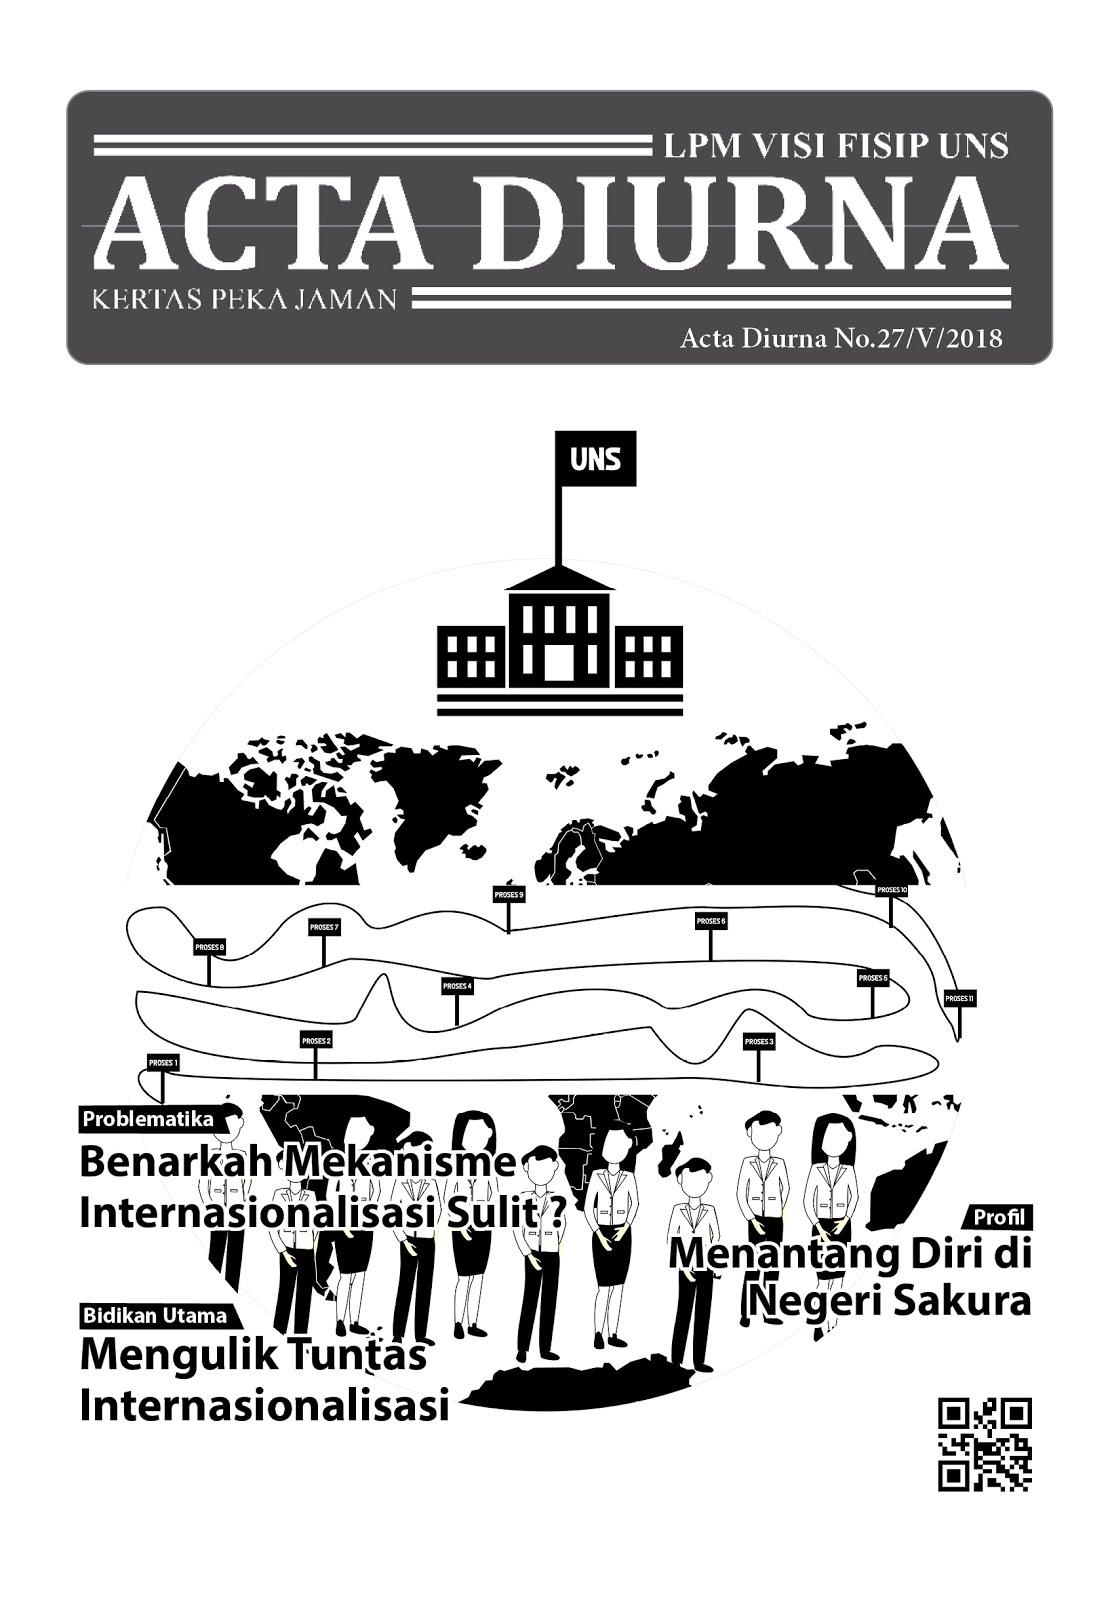 Buletin Acta Diurna 27